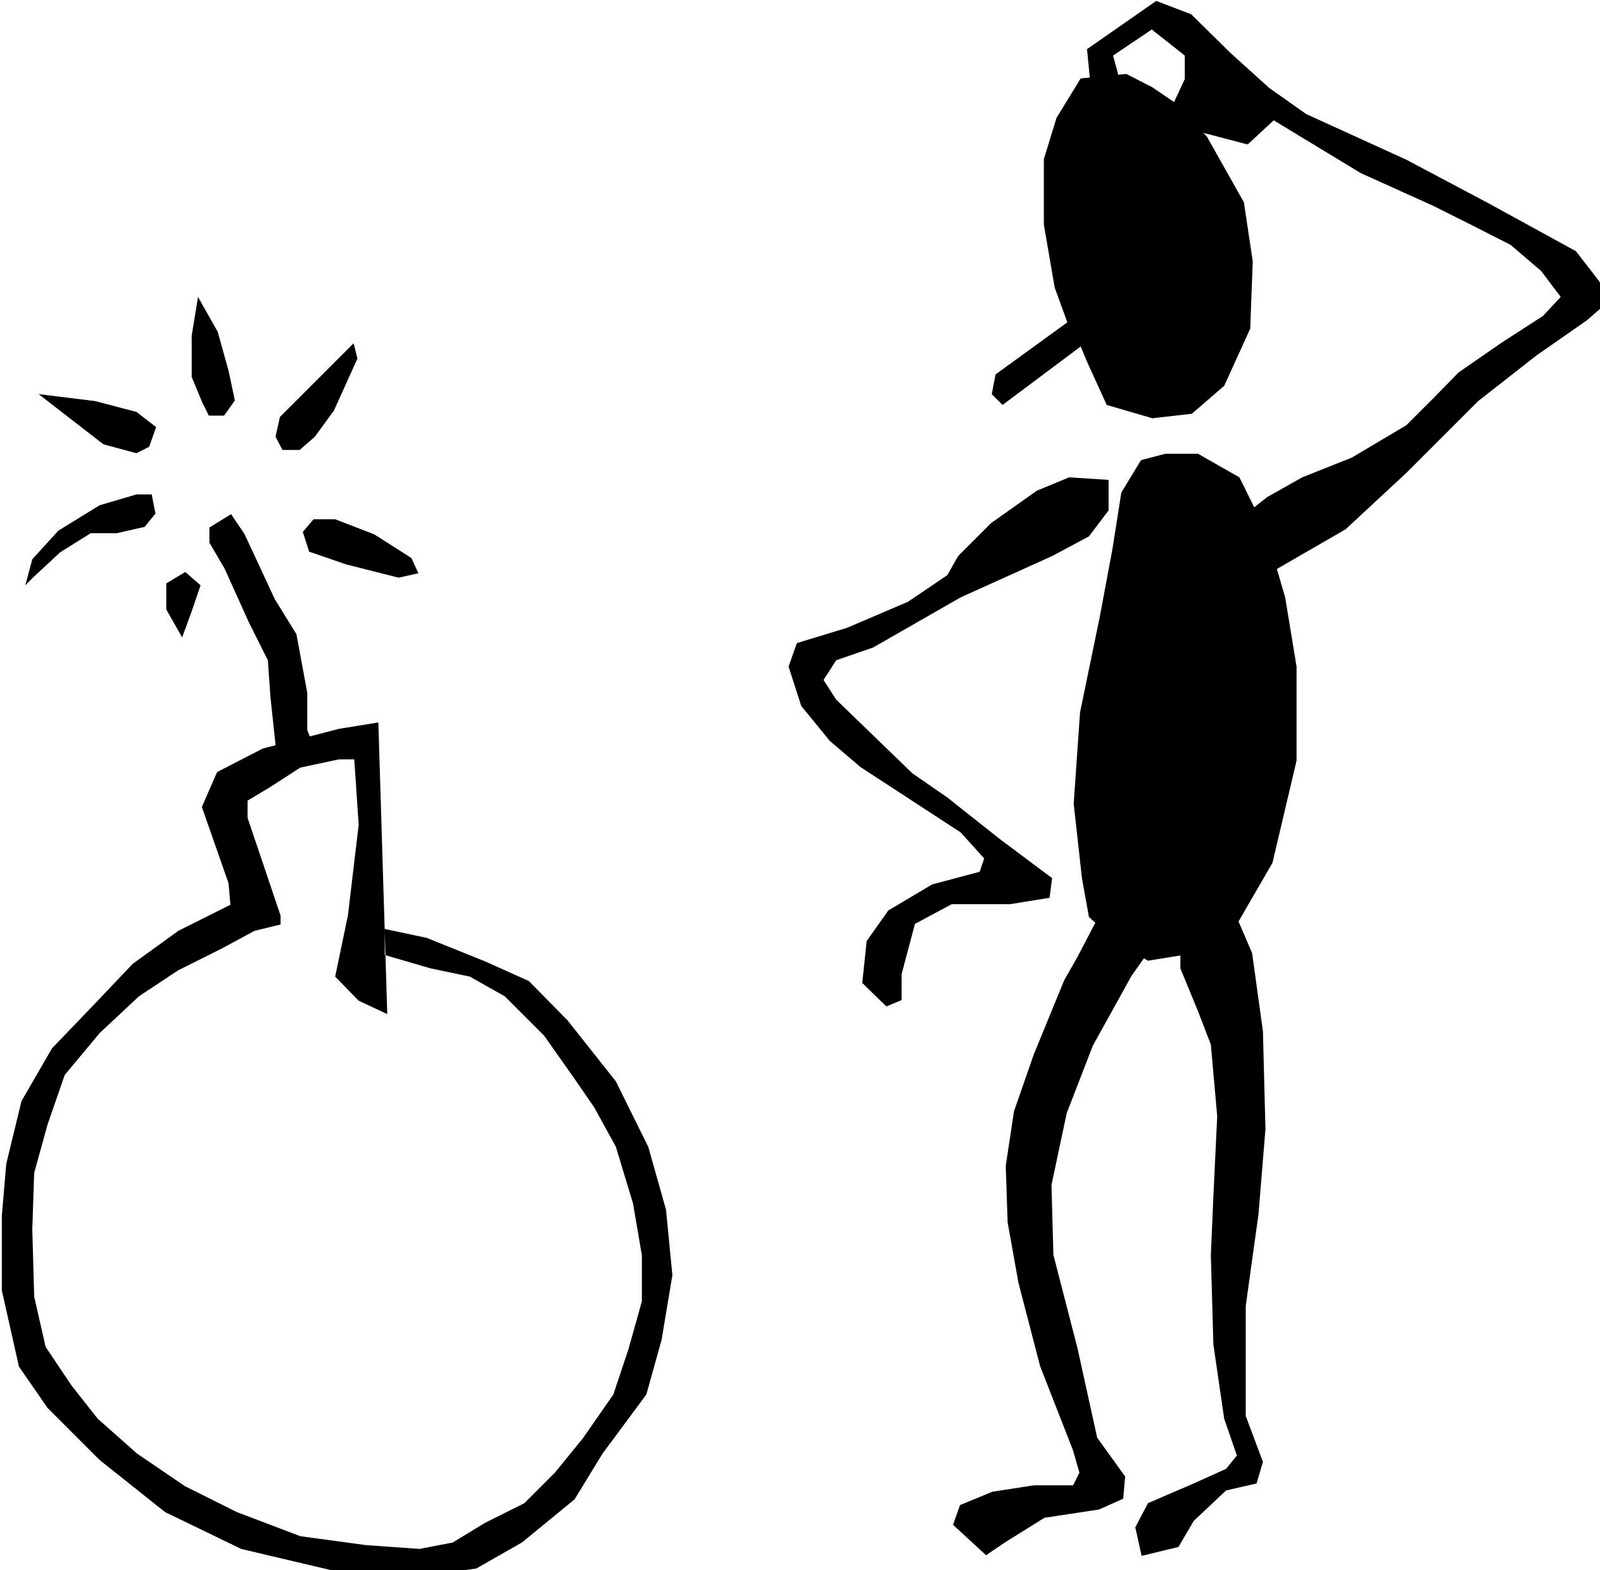 Thinking stick figure clipart clipartix.